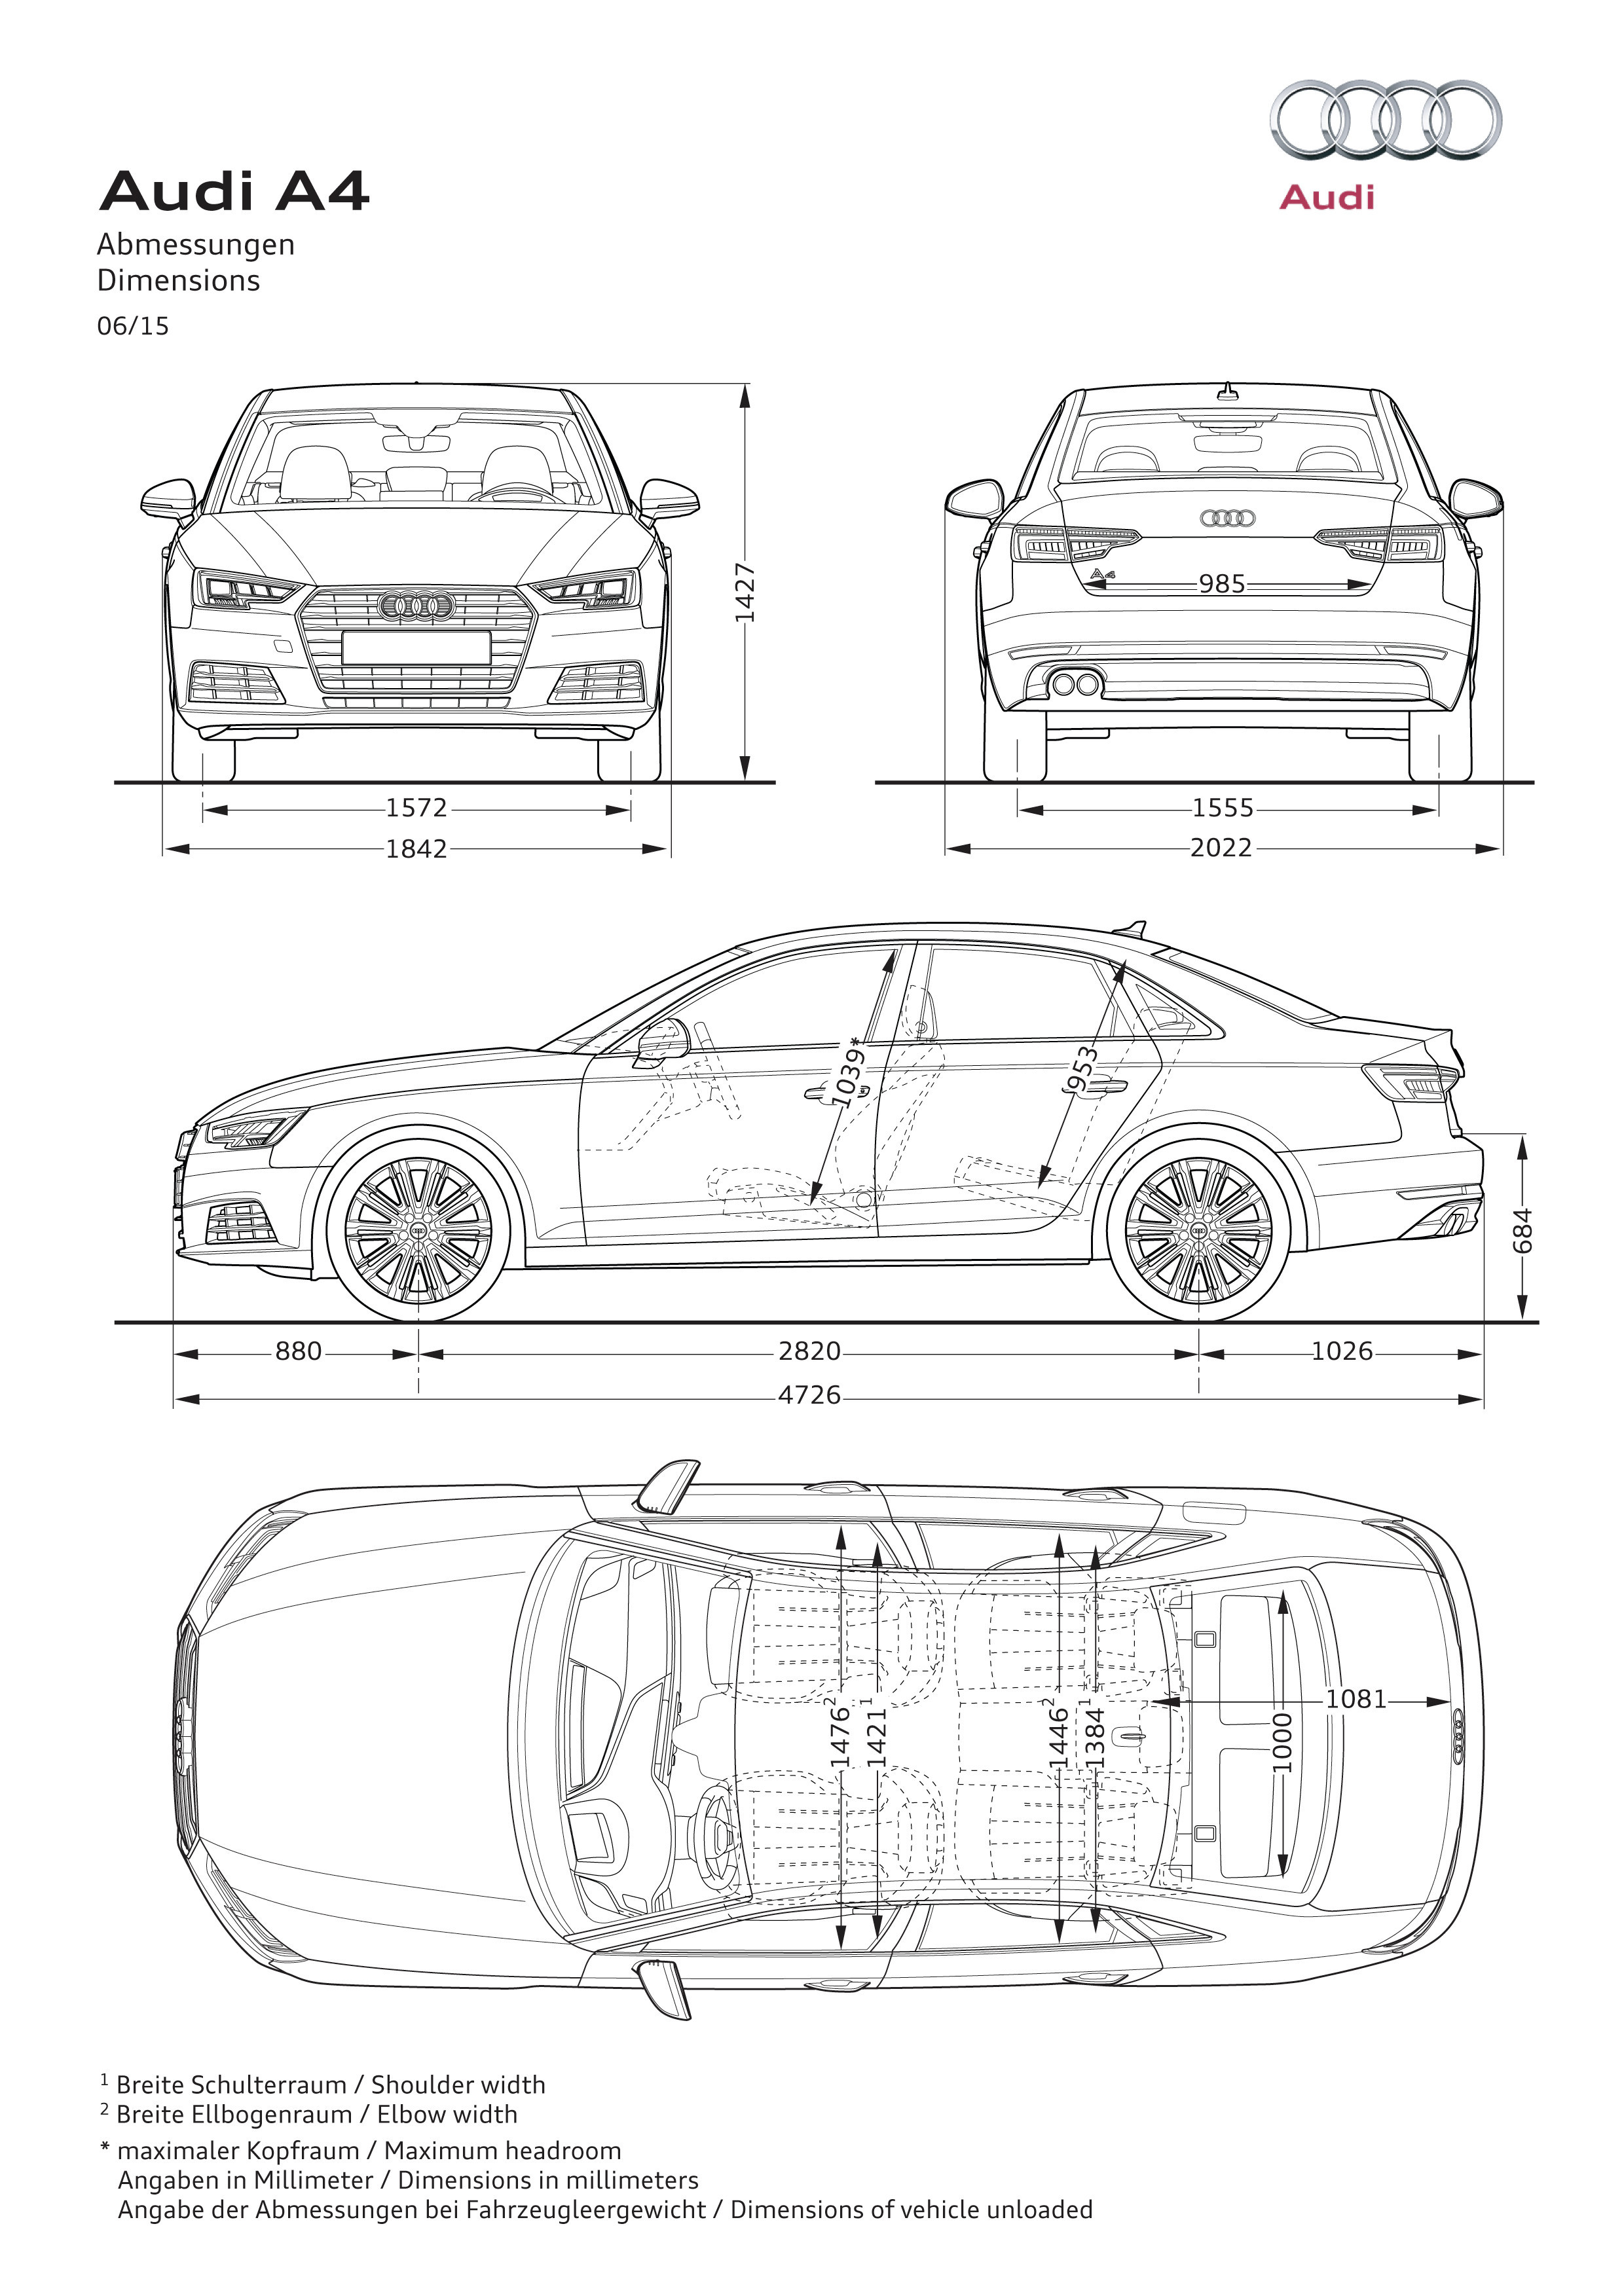 Audi A4 Saloon Dimensions